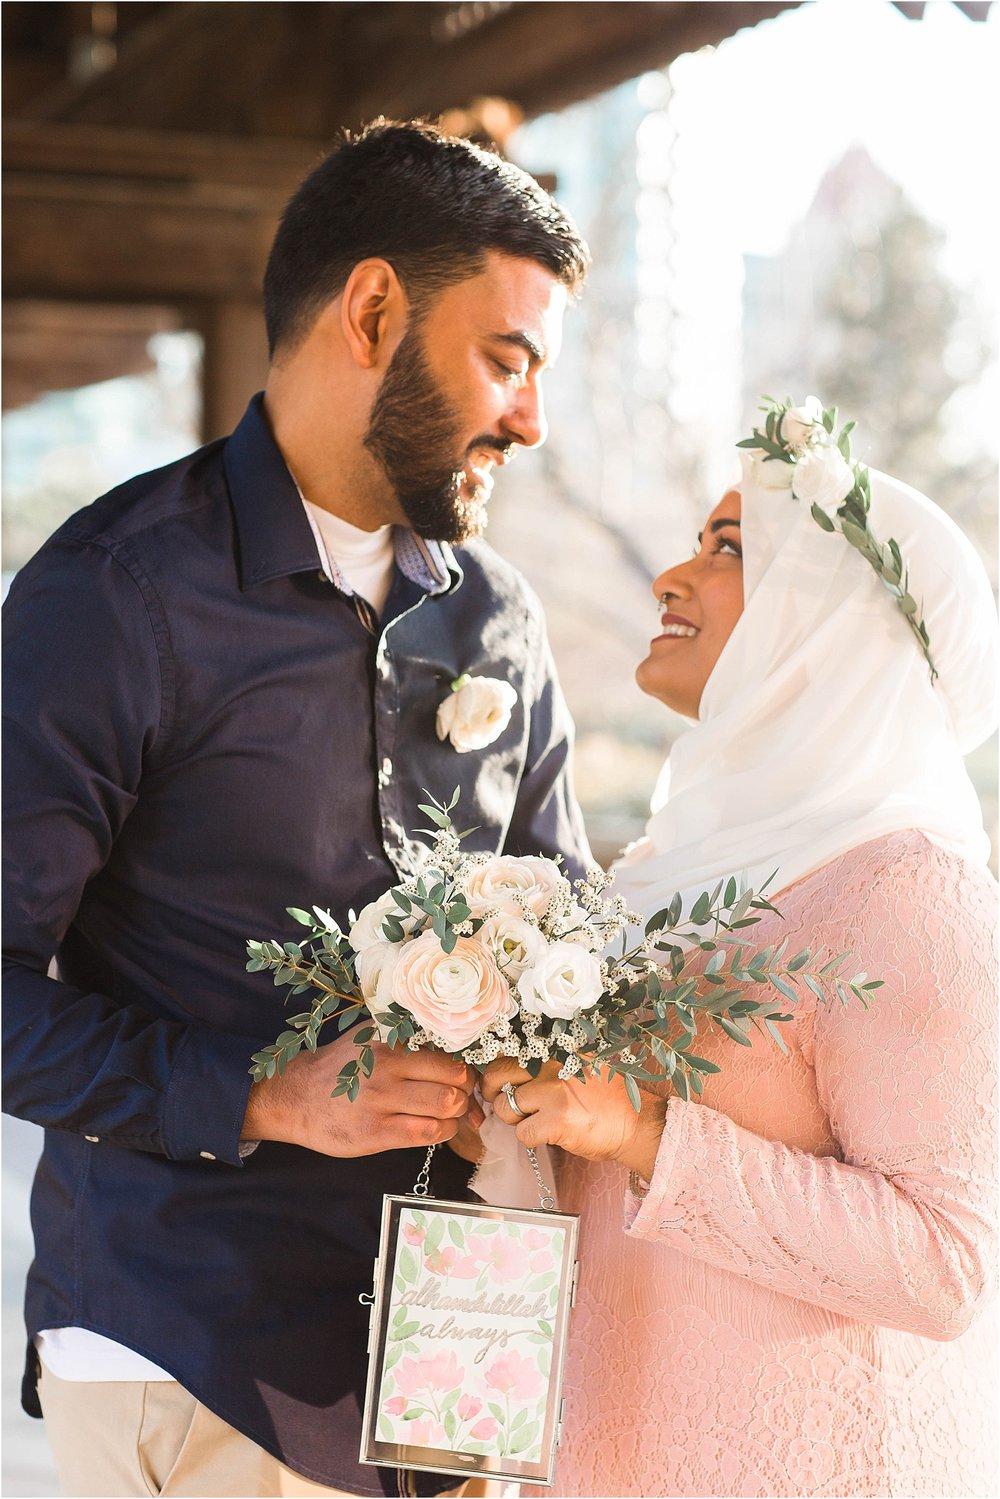 Kariya-Park-Anniversary-Session-Toronto-Mississauga-Brampton-Scarborough-GTA-Pakistani-Indian-Wedding-Engagement-Photographer-Photography_0046.jpg